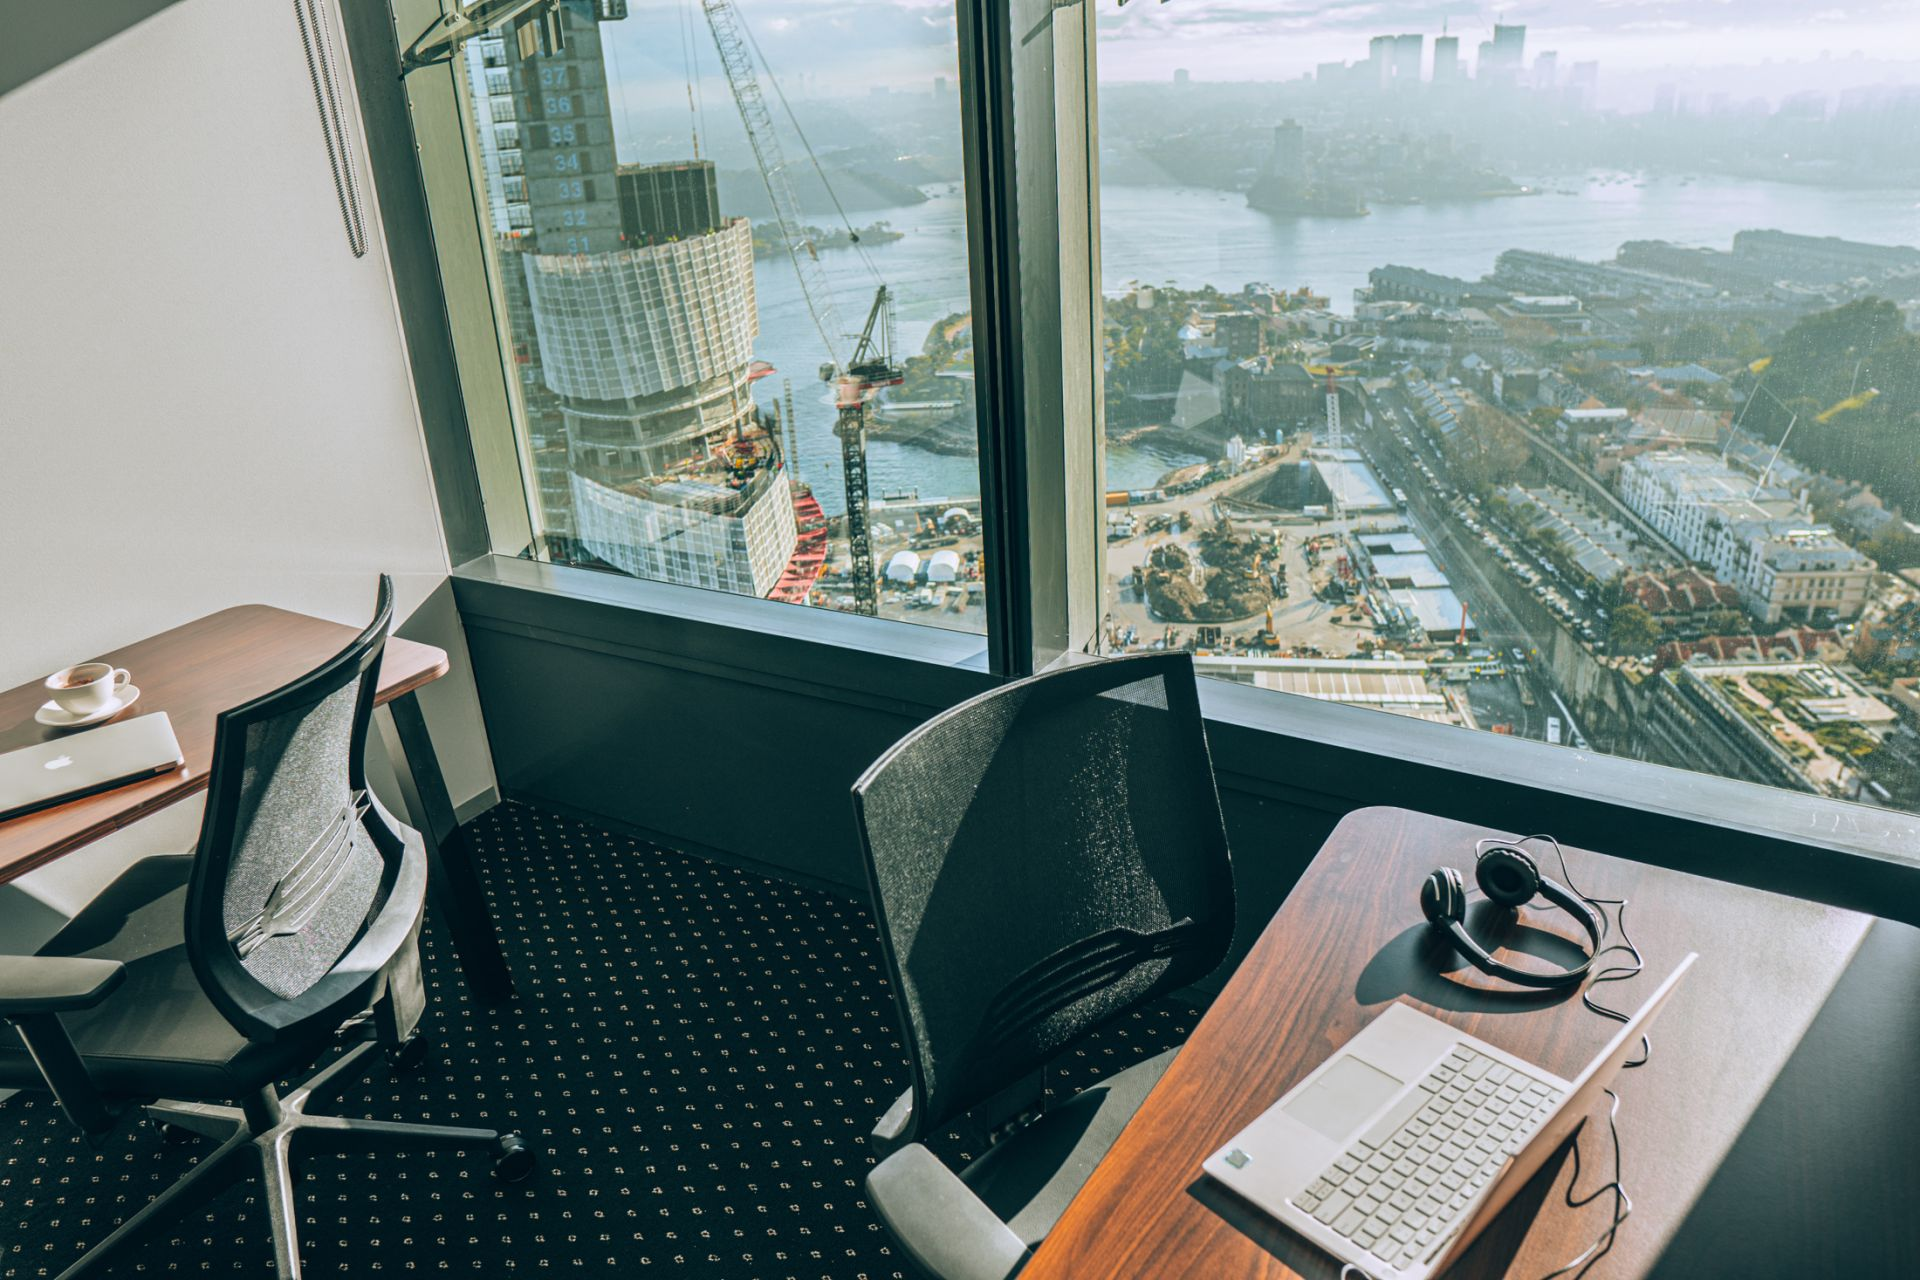 Servcorp Tower One Barangaroo, Sydney